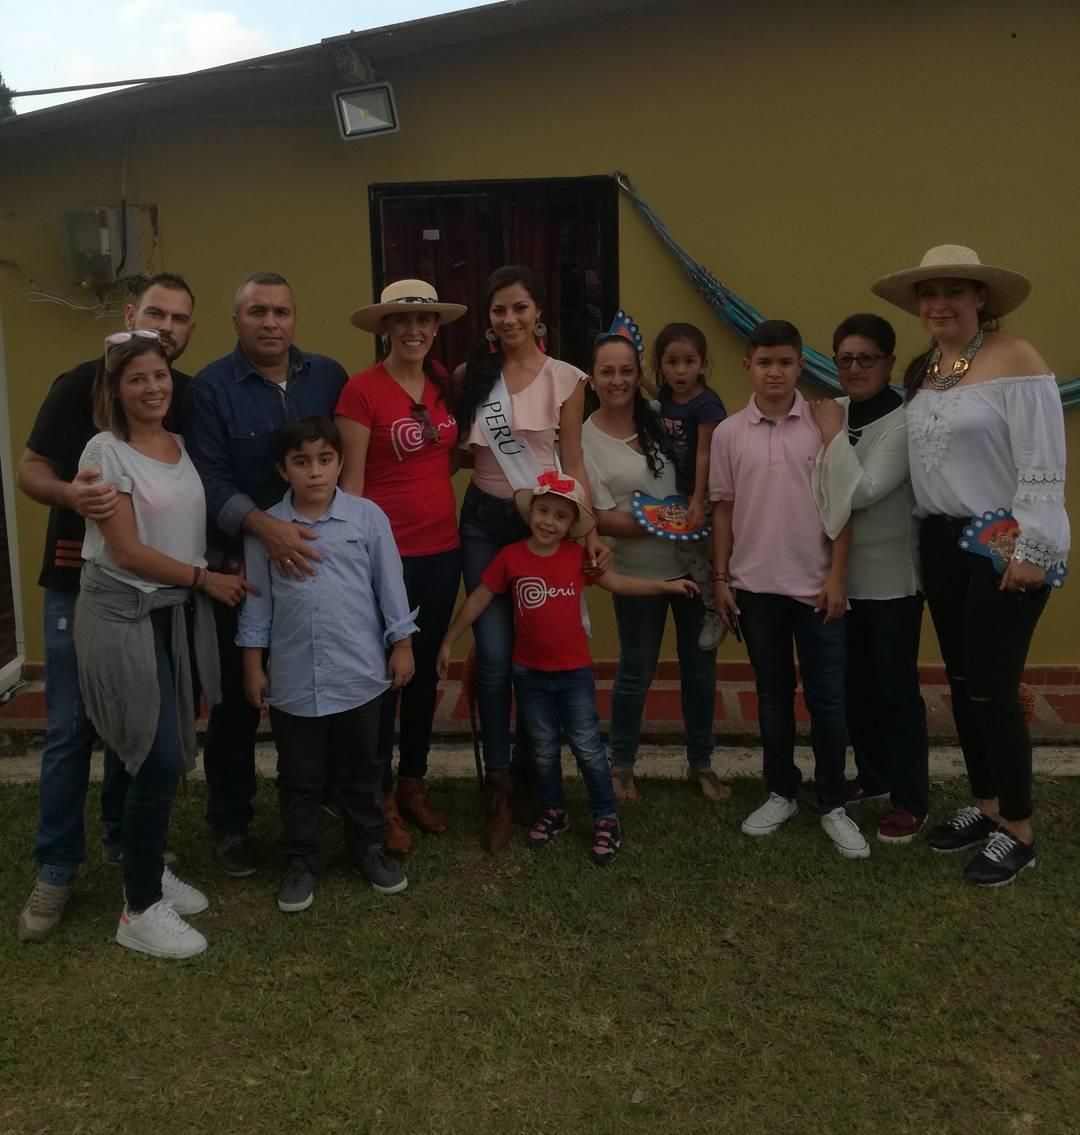 gabriela lambruschini, miss peru reyna internacional cafe 2018. - Página 3 26068900_1236292169805449_1427766645245345792_n